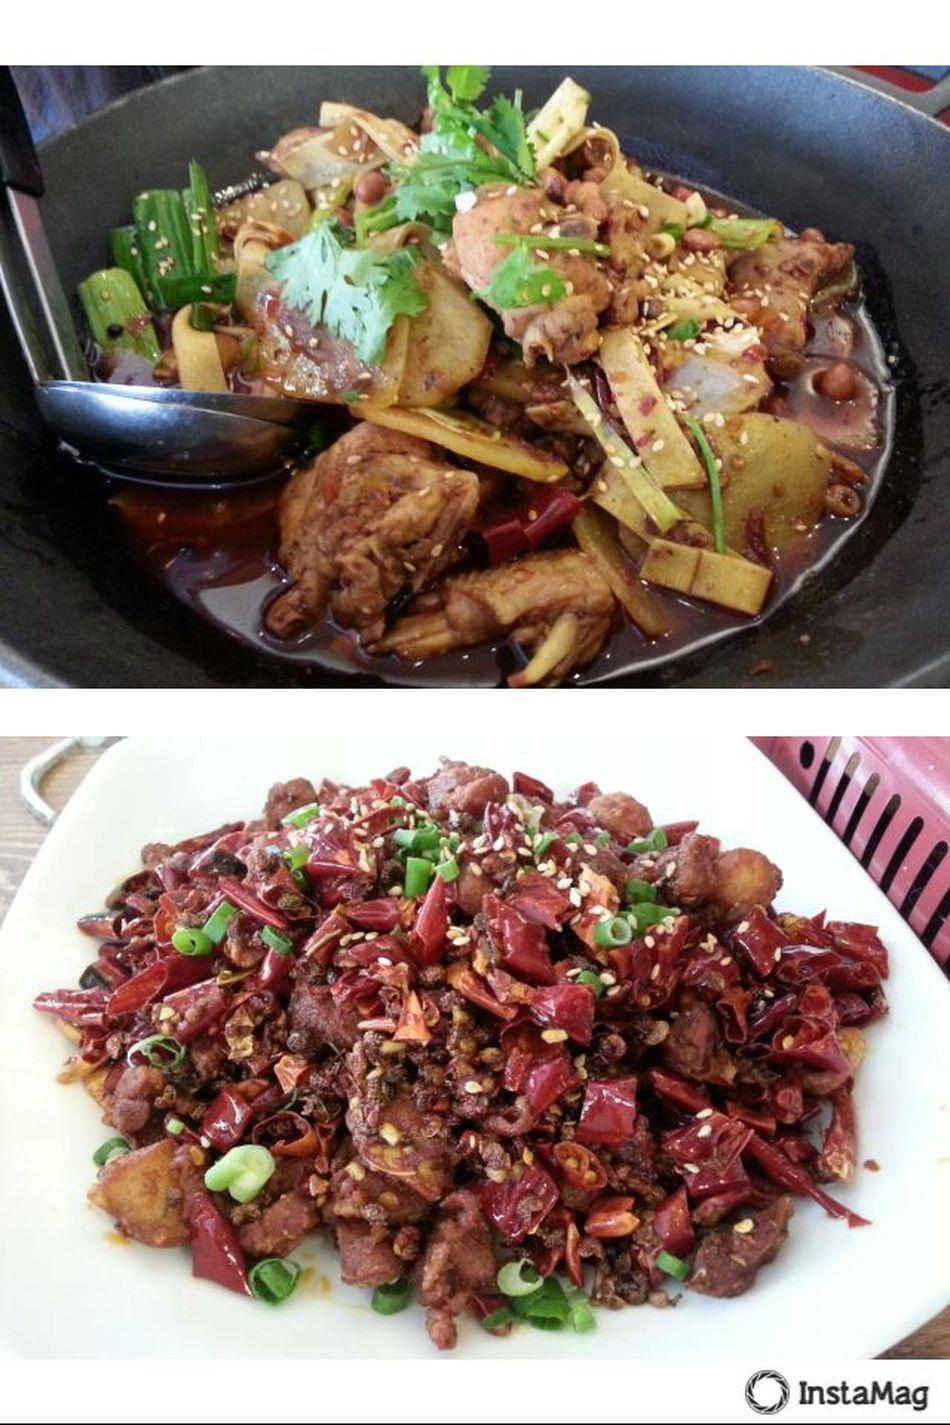 Singapore Bugis Fat Bird Hot Pot Spicy Chicken Cubes 싱가폴 치킨핫팟